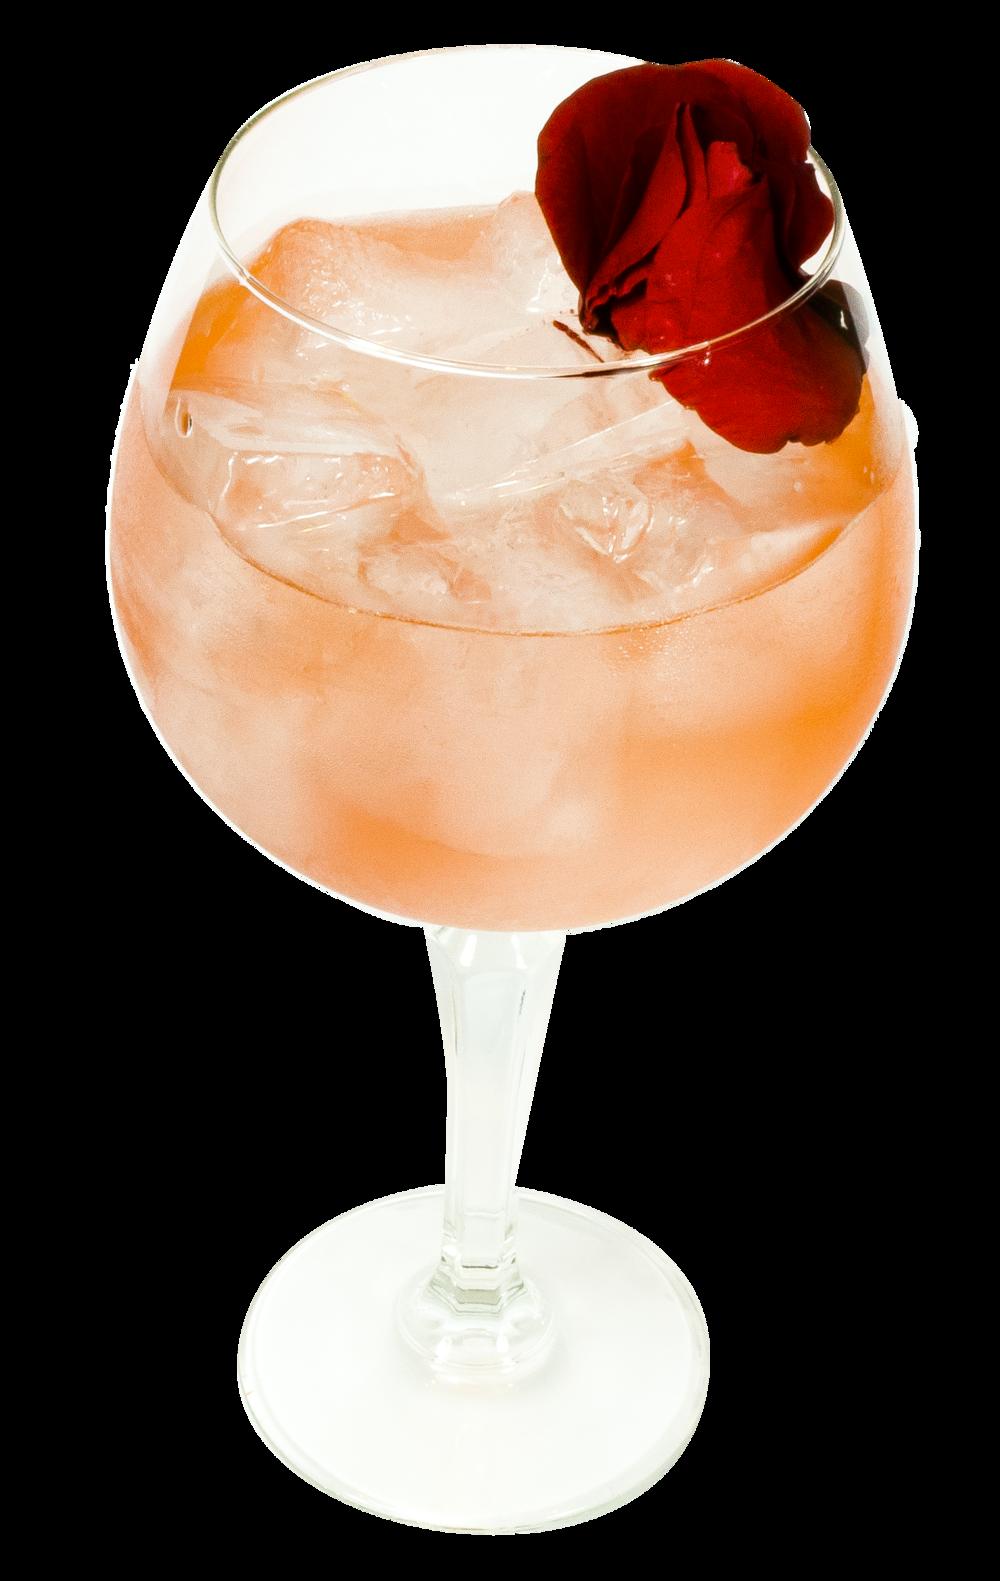 25ml Bath Gin 25ml Damson Bath Gin 12.5ml Escubac 25ml Pamplemousse Liqueur 12.5ml Lemon juice 75ml Rose Lemonade